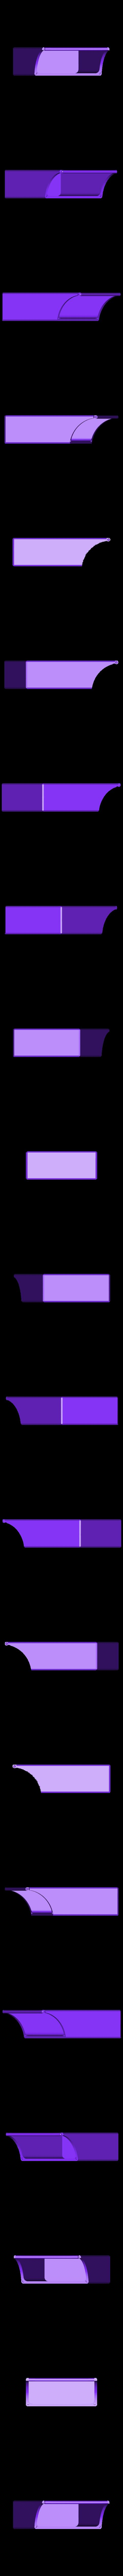 box.stl Download free STL file Magnetic Cigarette Box • Design to 3D print, senns